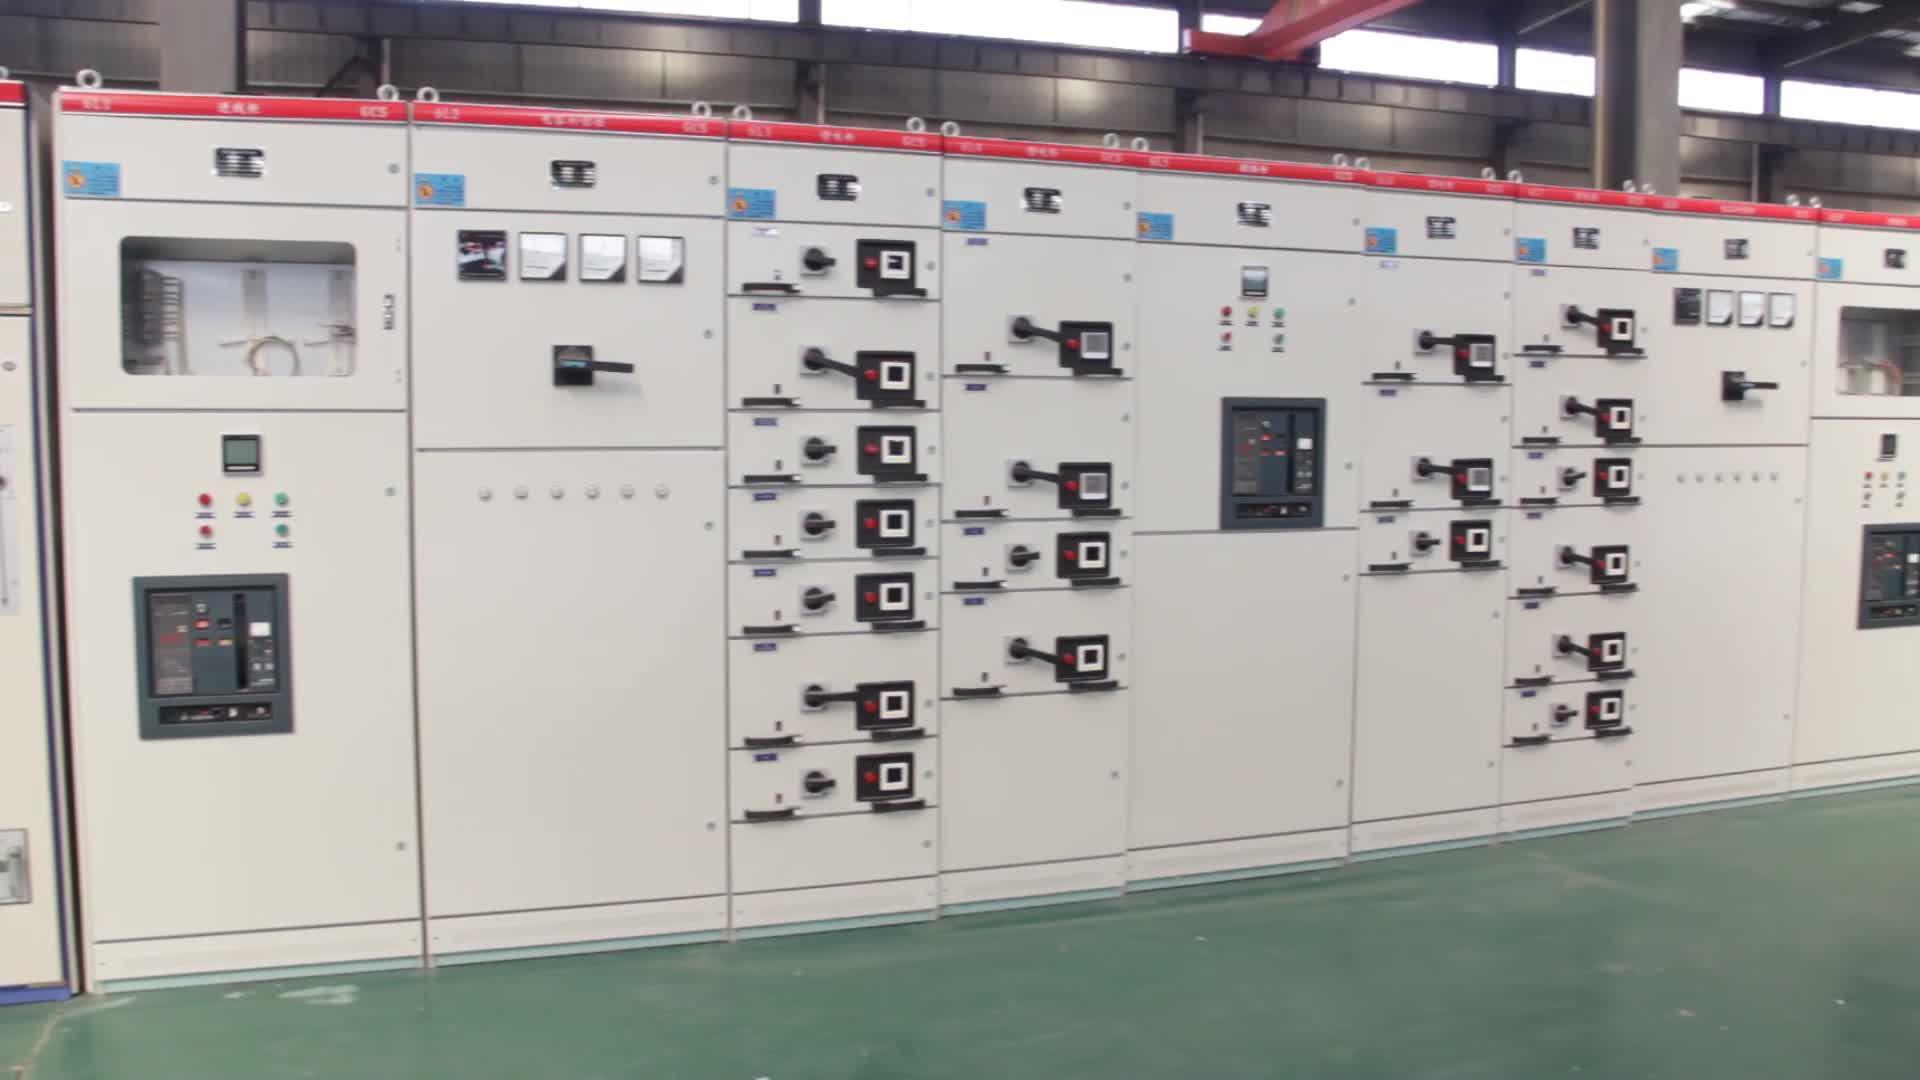 power supply high voltage 10KV/0.4KV pad mounted box substation transformer